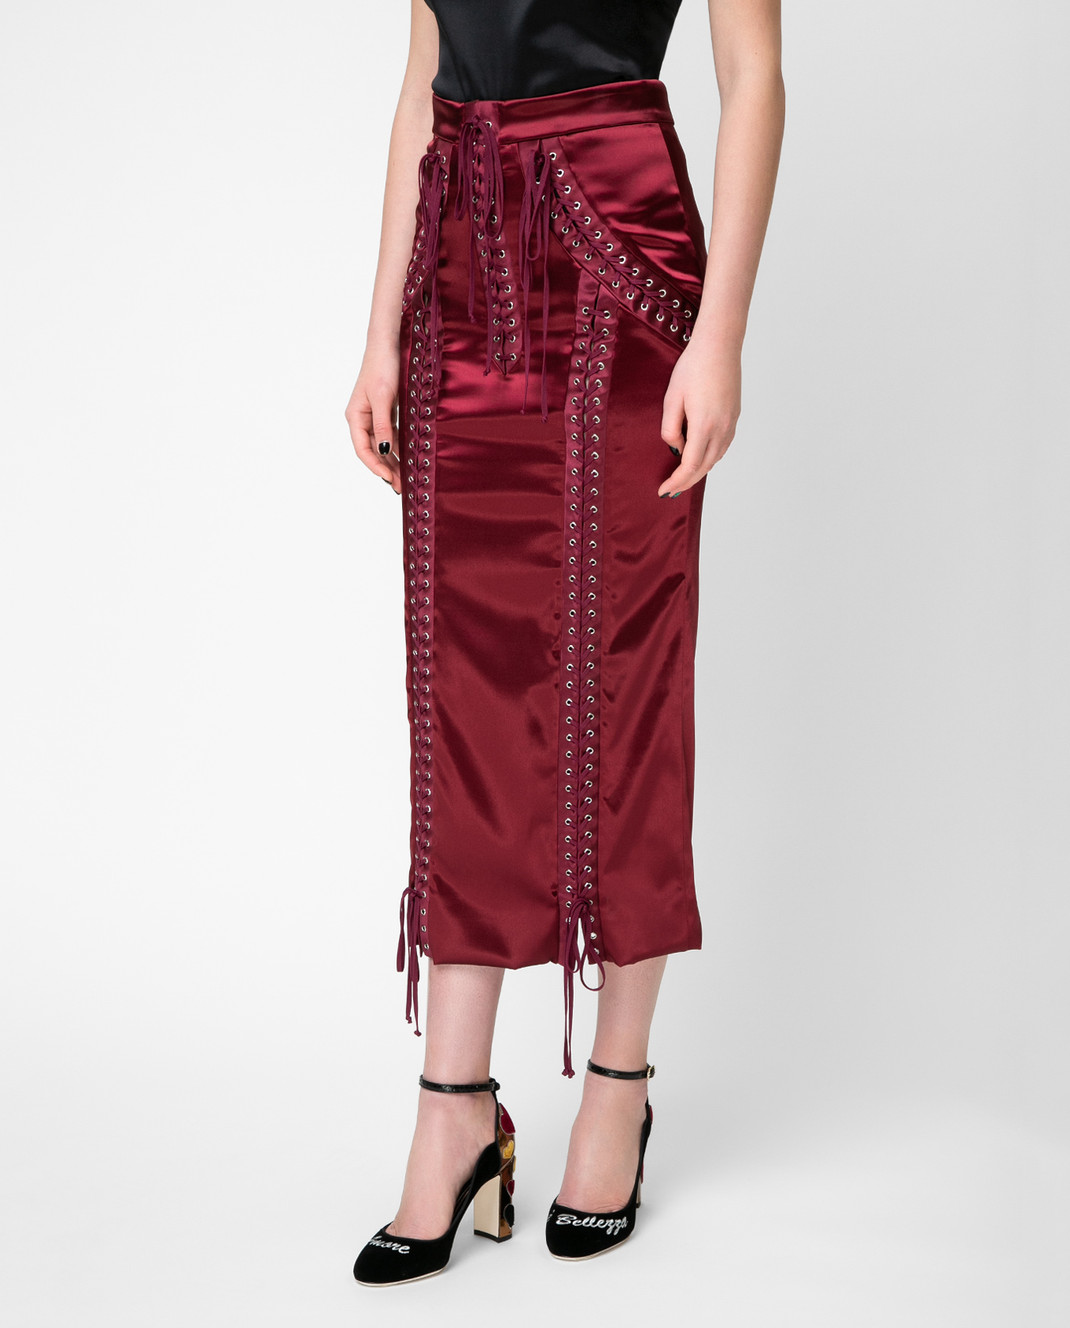 Dolce&Gabbana Красная юбка F4BCNTFURAD изображение 3